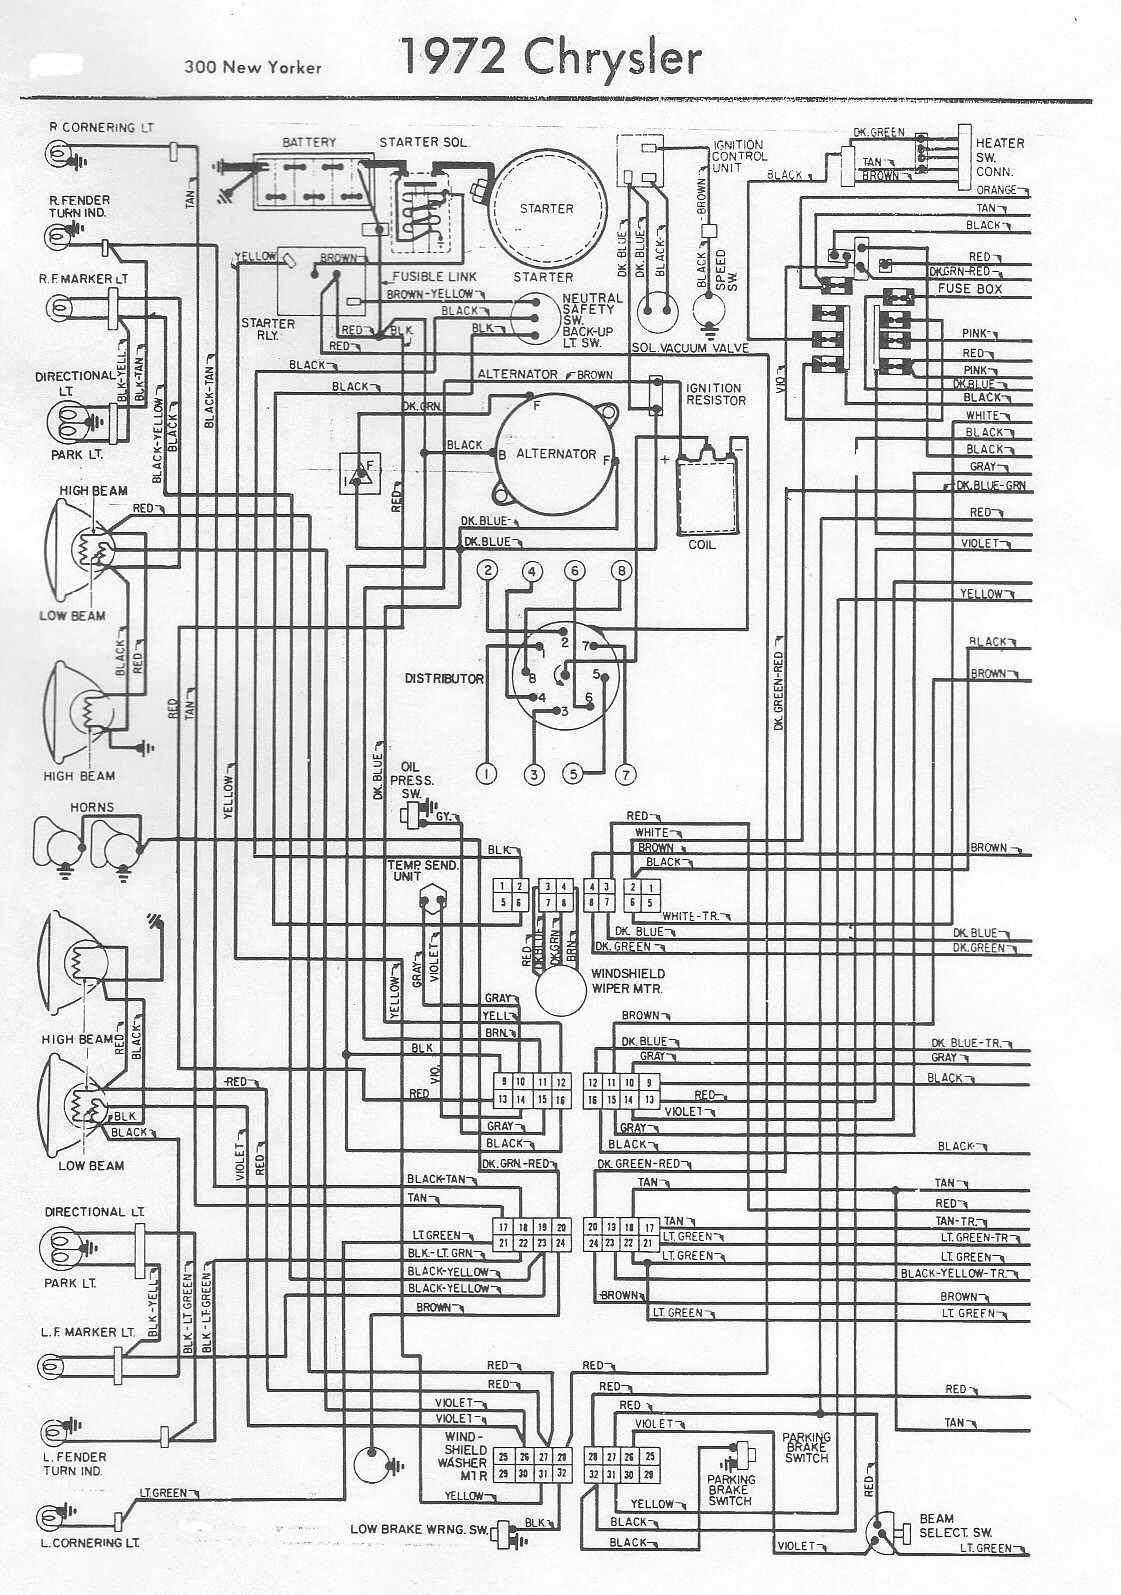 small resolution of 1992 chrysler lebaron wiring diagram